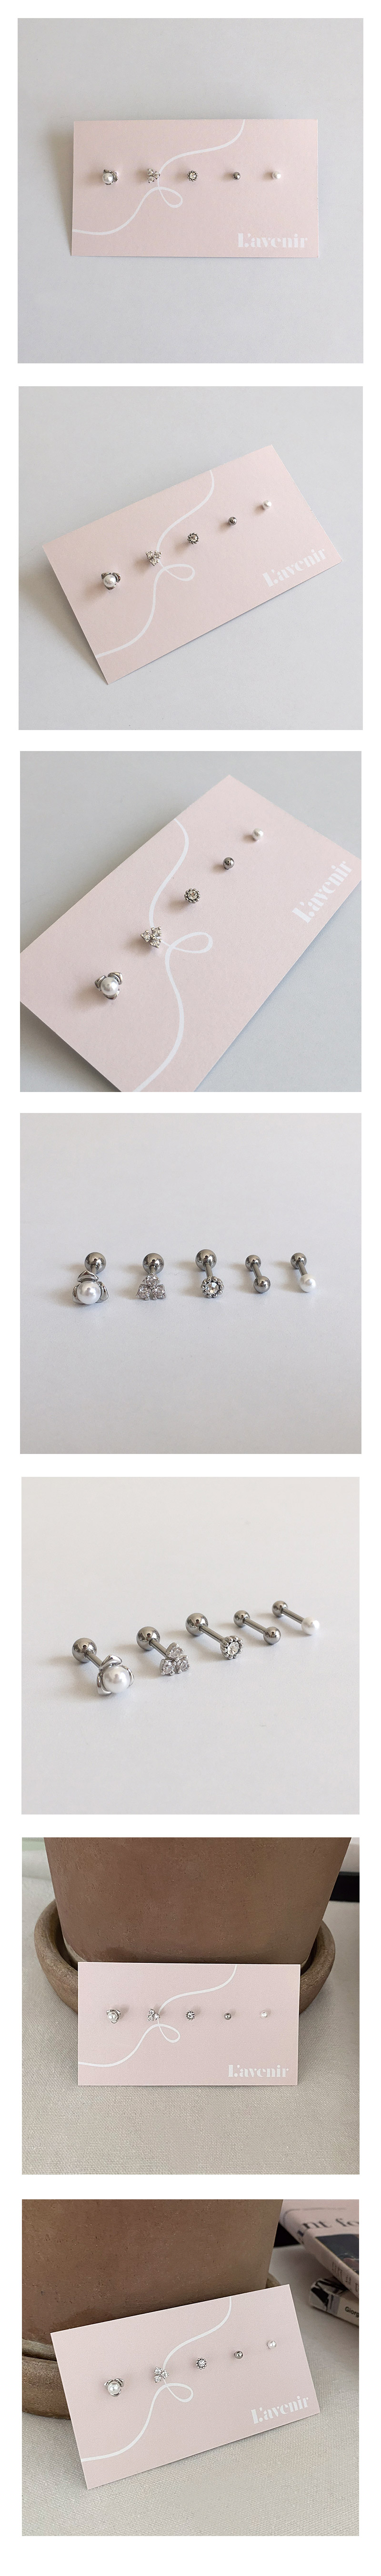 burst piercing set